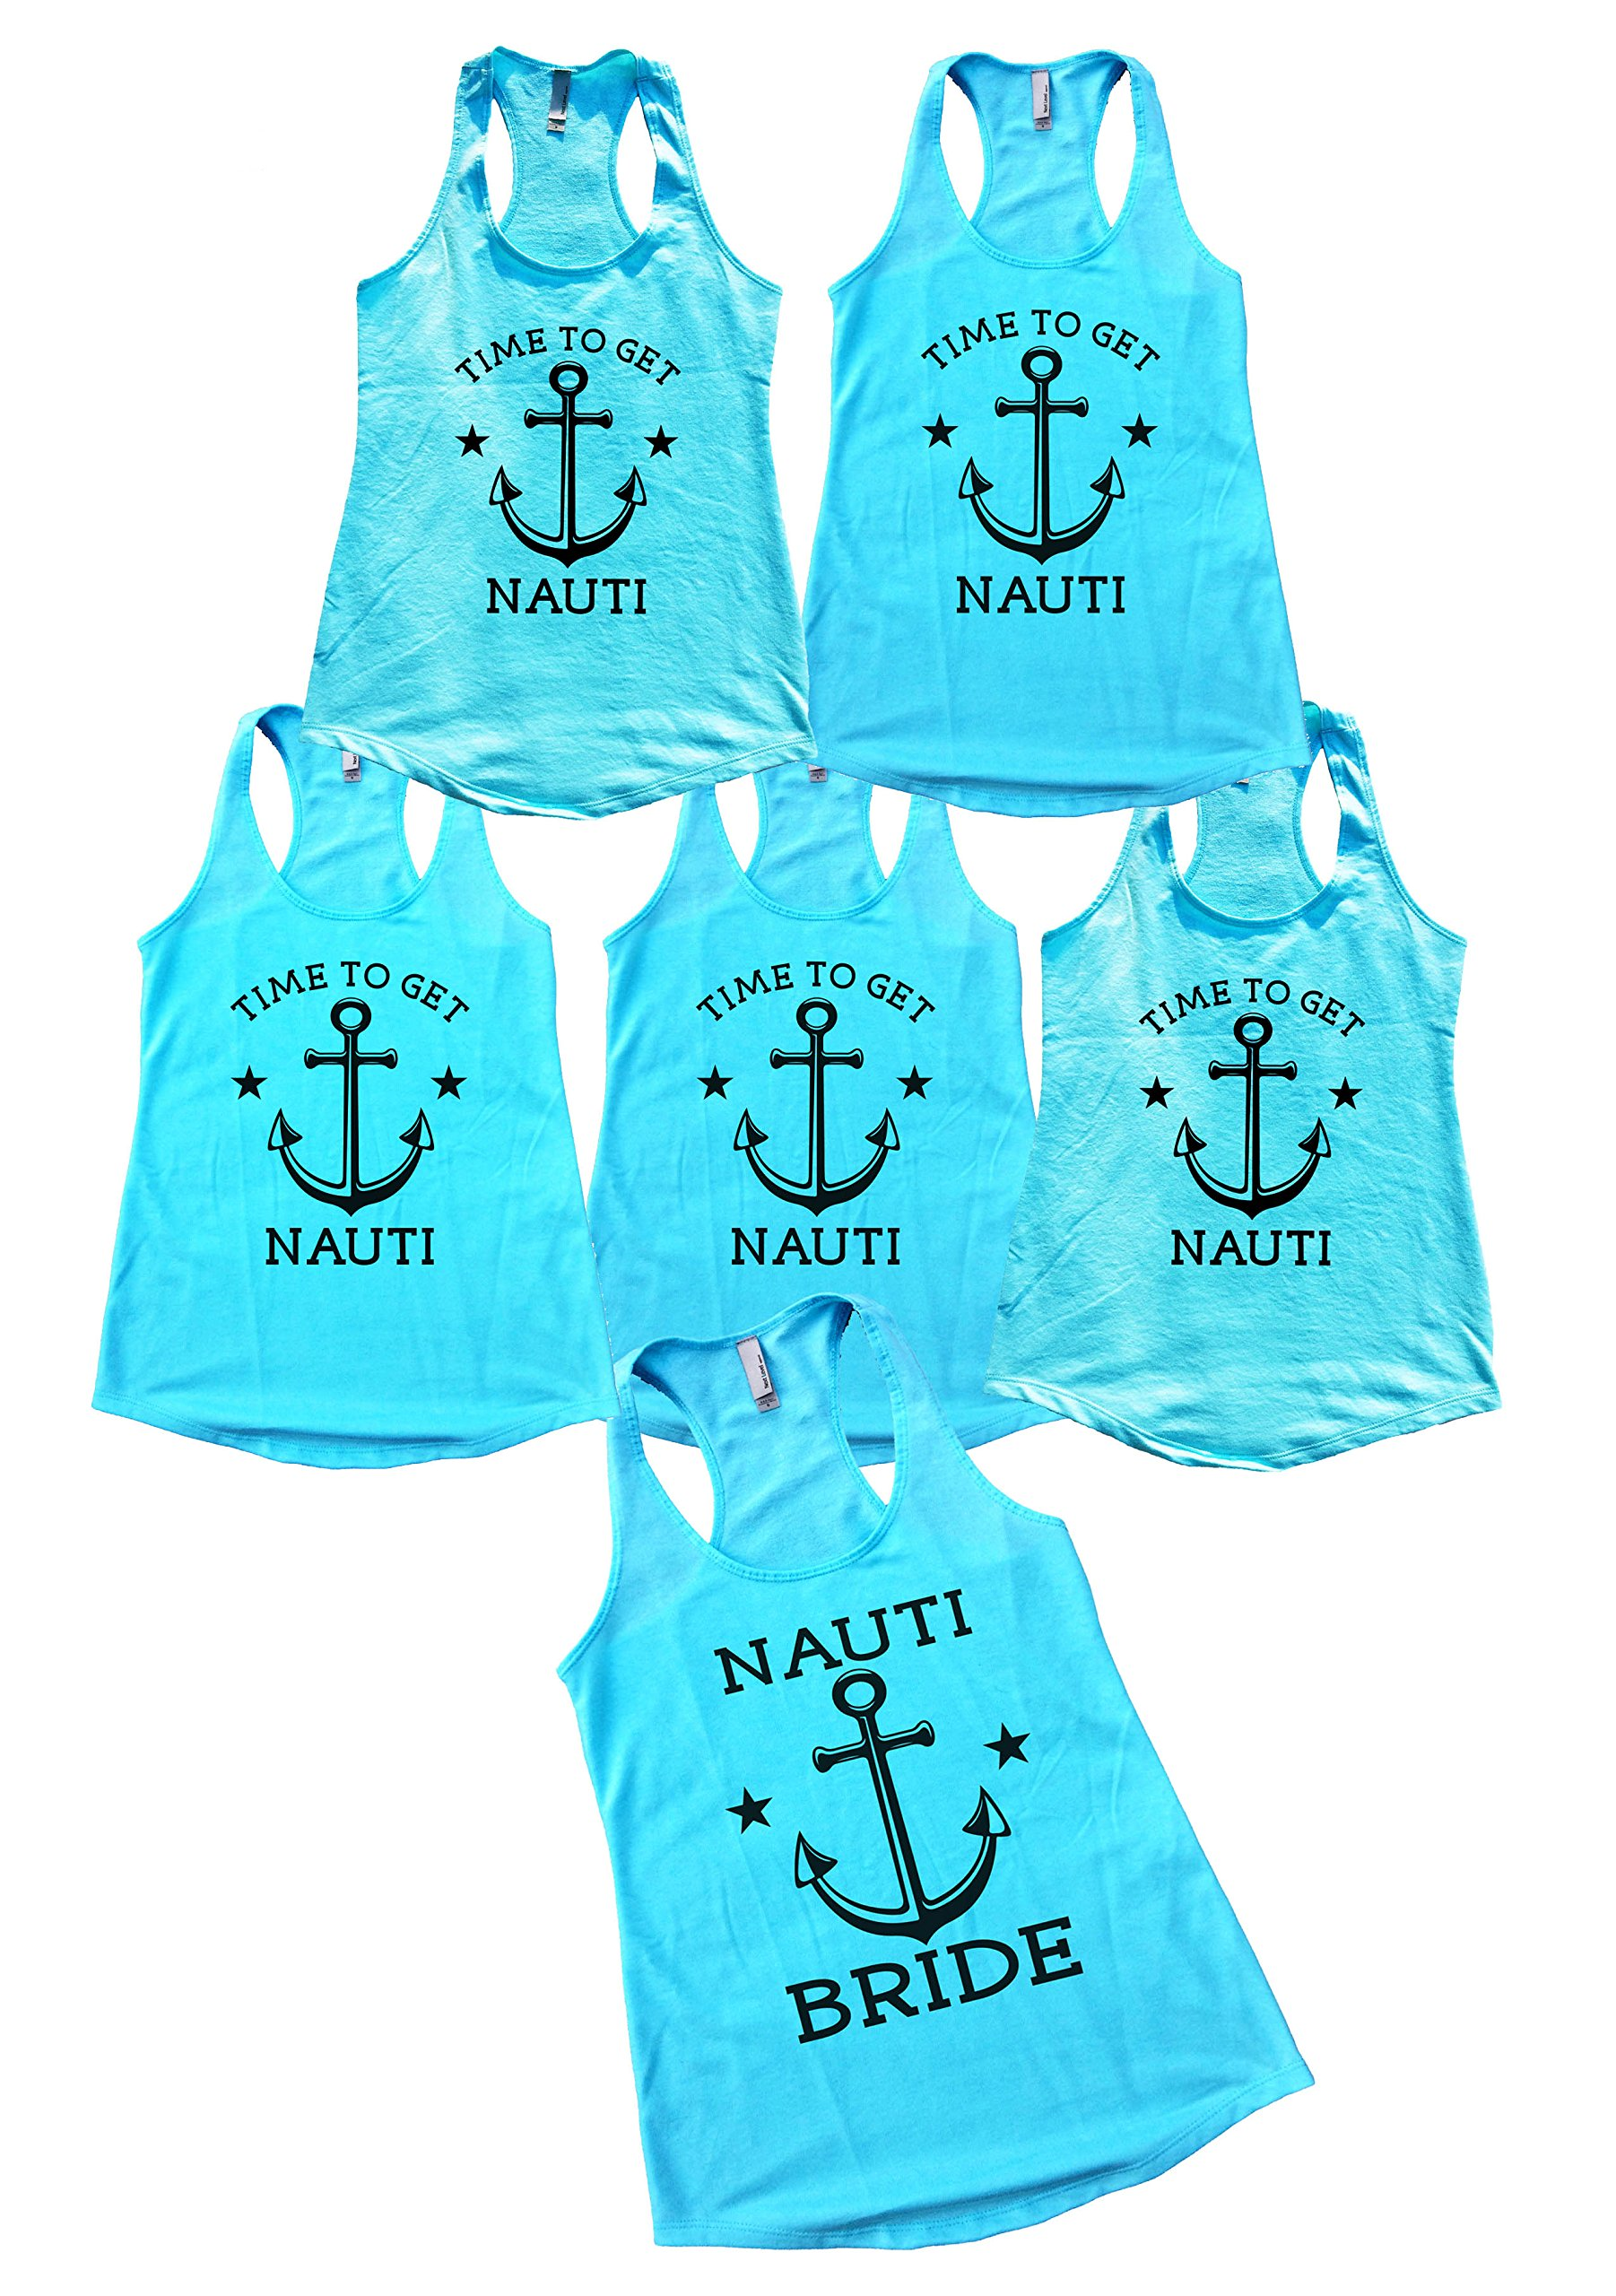 Bridal Party Tank Top Set 6 Pieces Lets Get Nauti Bachlorette Party - Funny Threadz (Message Us The Sizes)